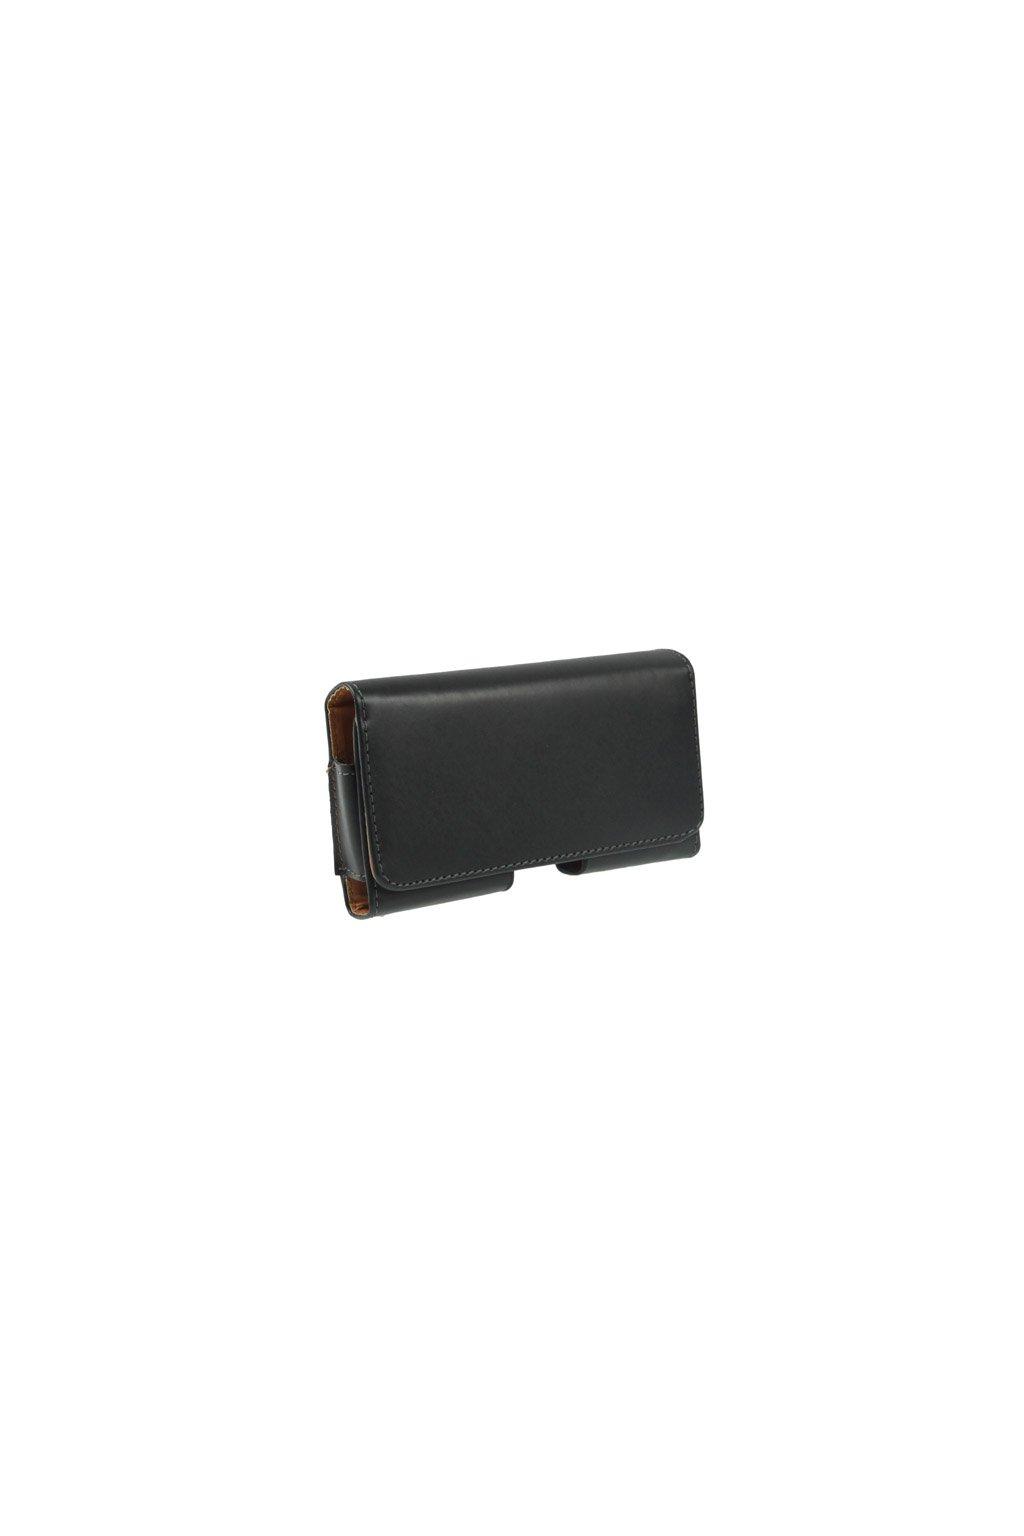 Koženkové pouzdro na opasek Apple iPhone 6/6S/7